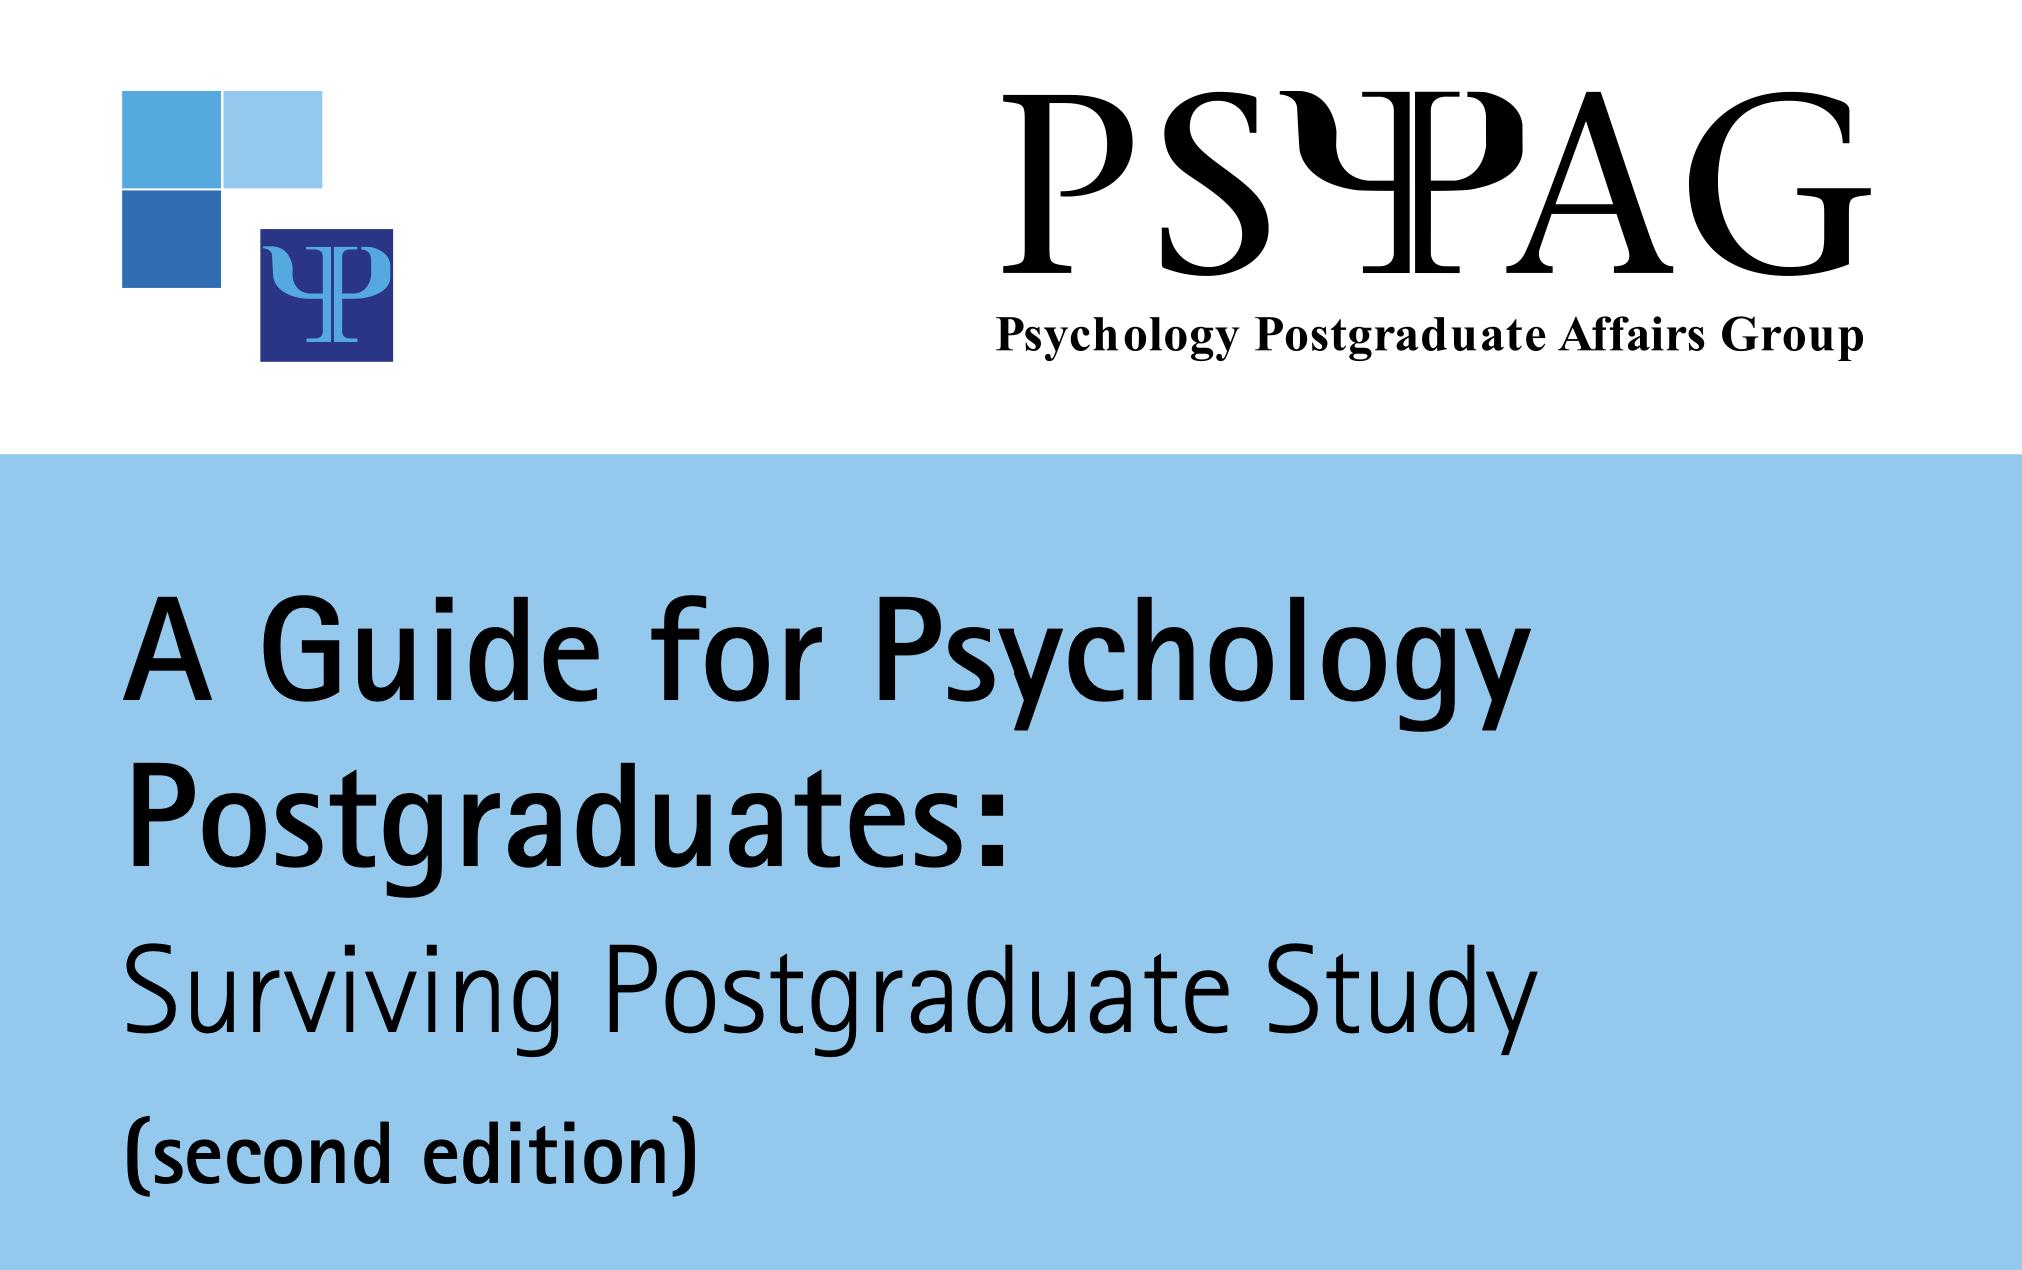 A Guide for Psychology Postgraduates: Surviving Postgraduate Study